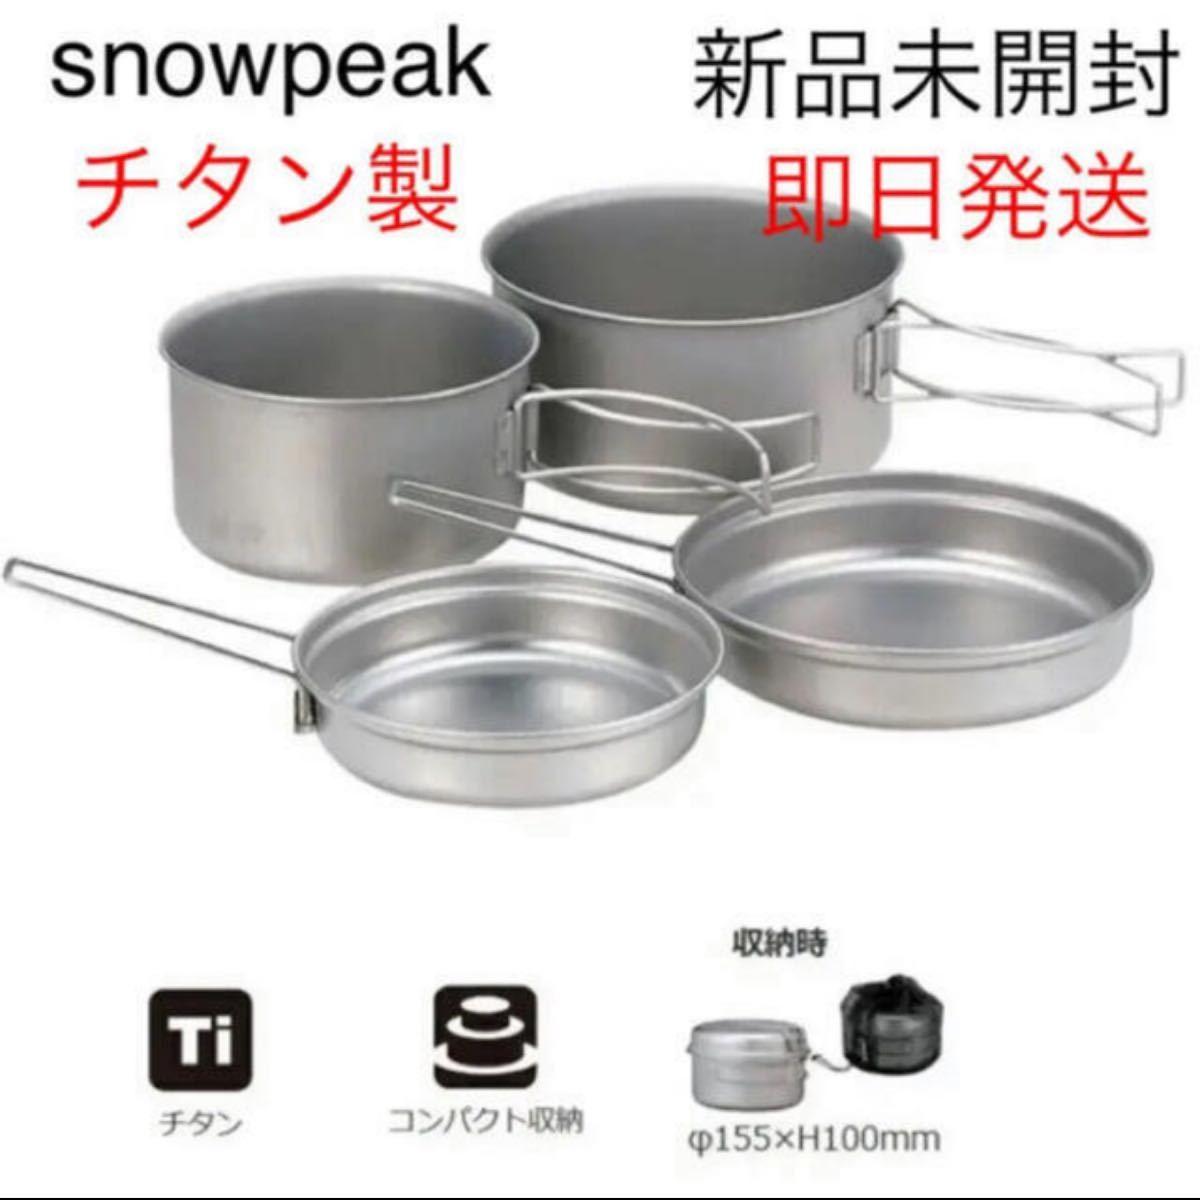 snow peak スノーピーク チタンパーソナルクッカーセット SCS020T 新品未開封